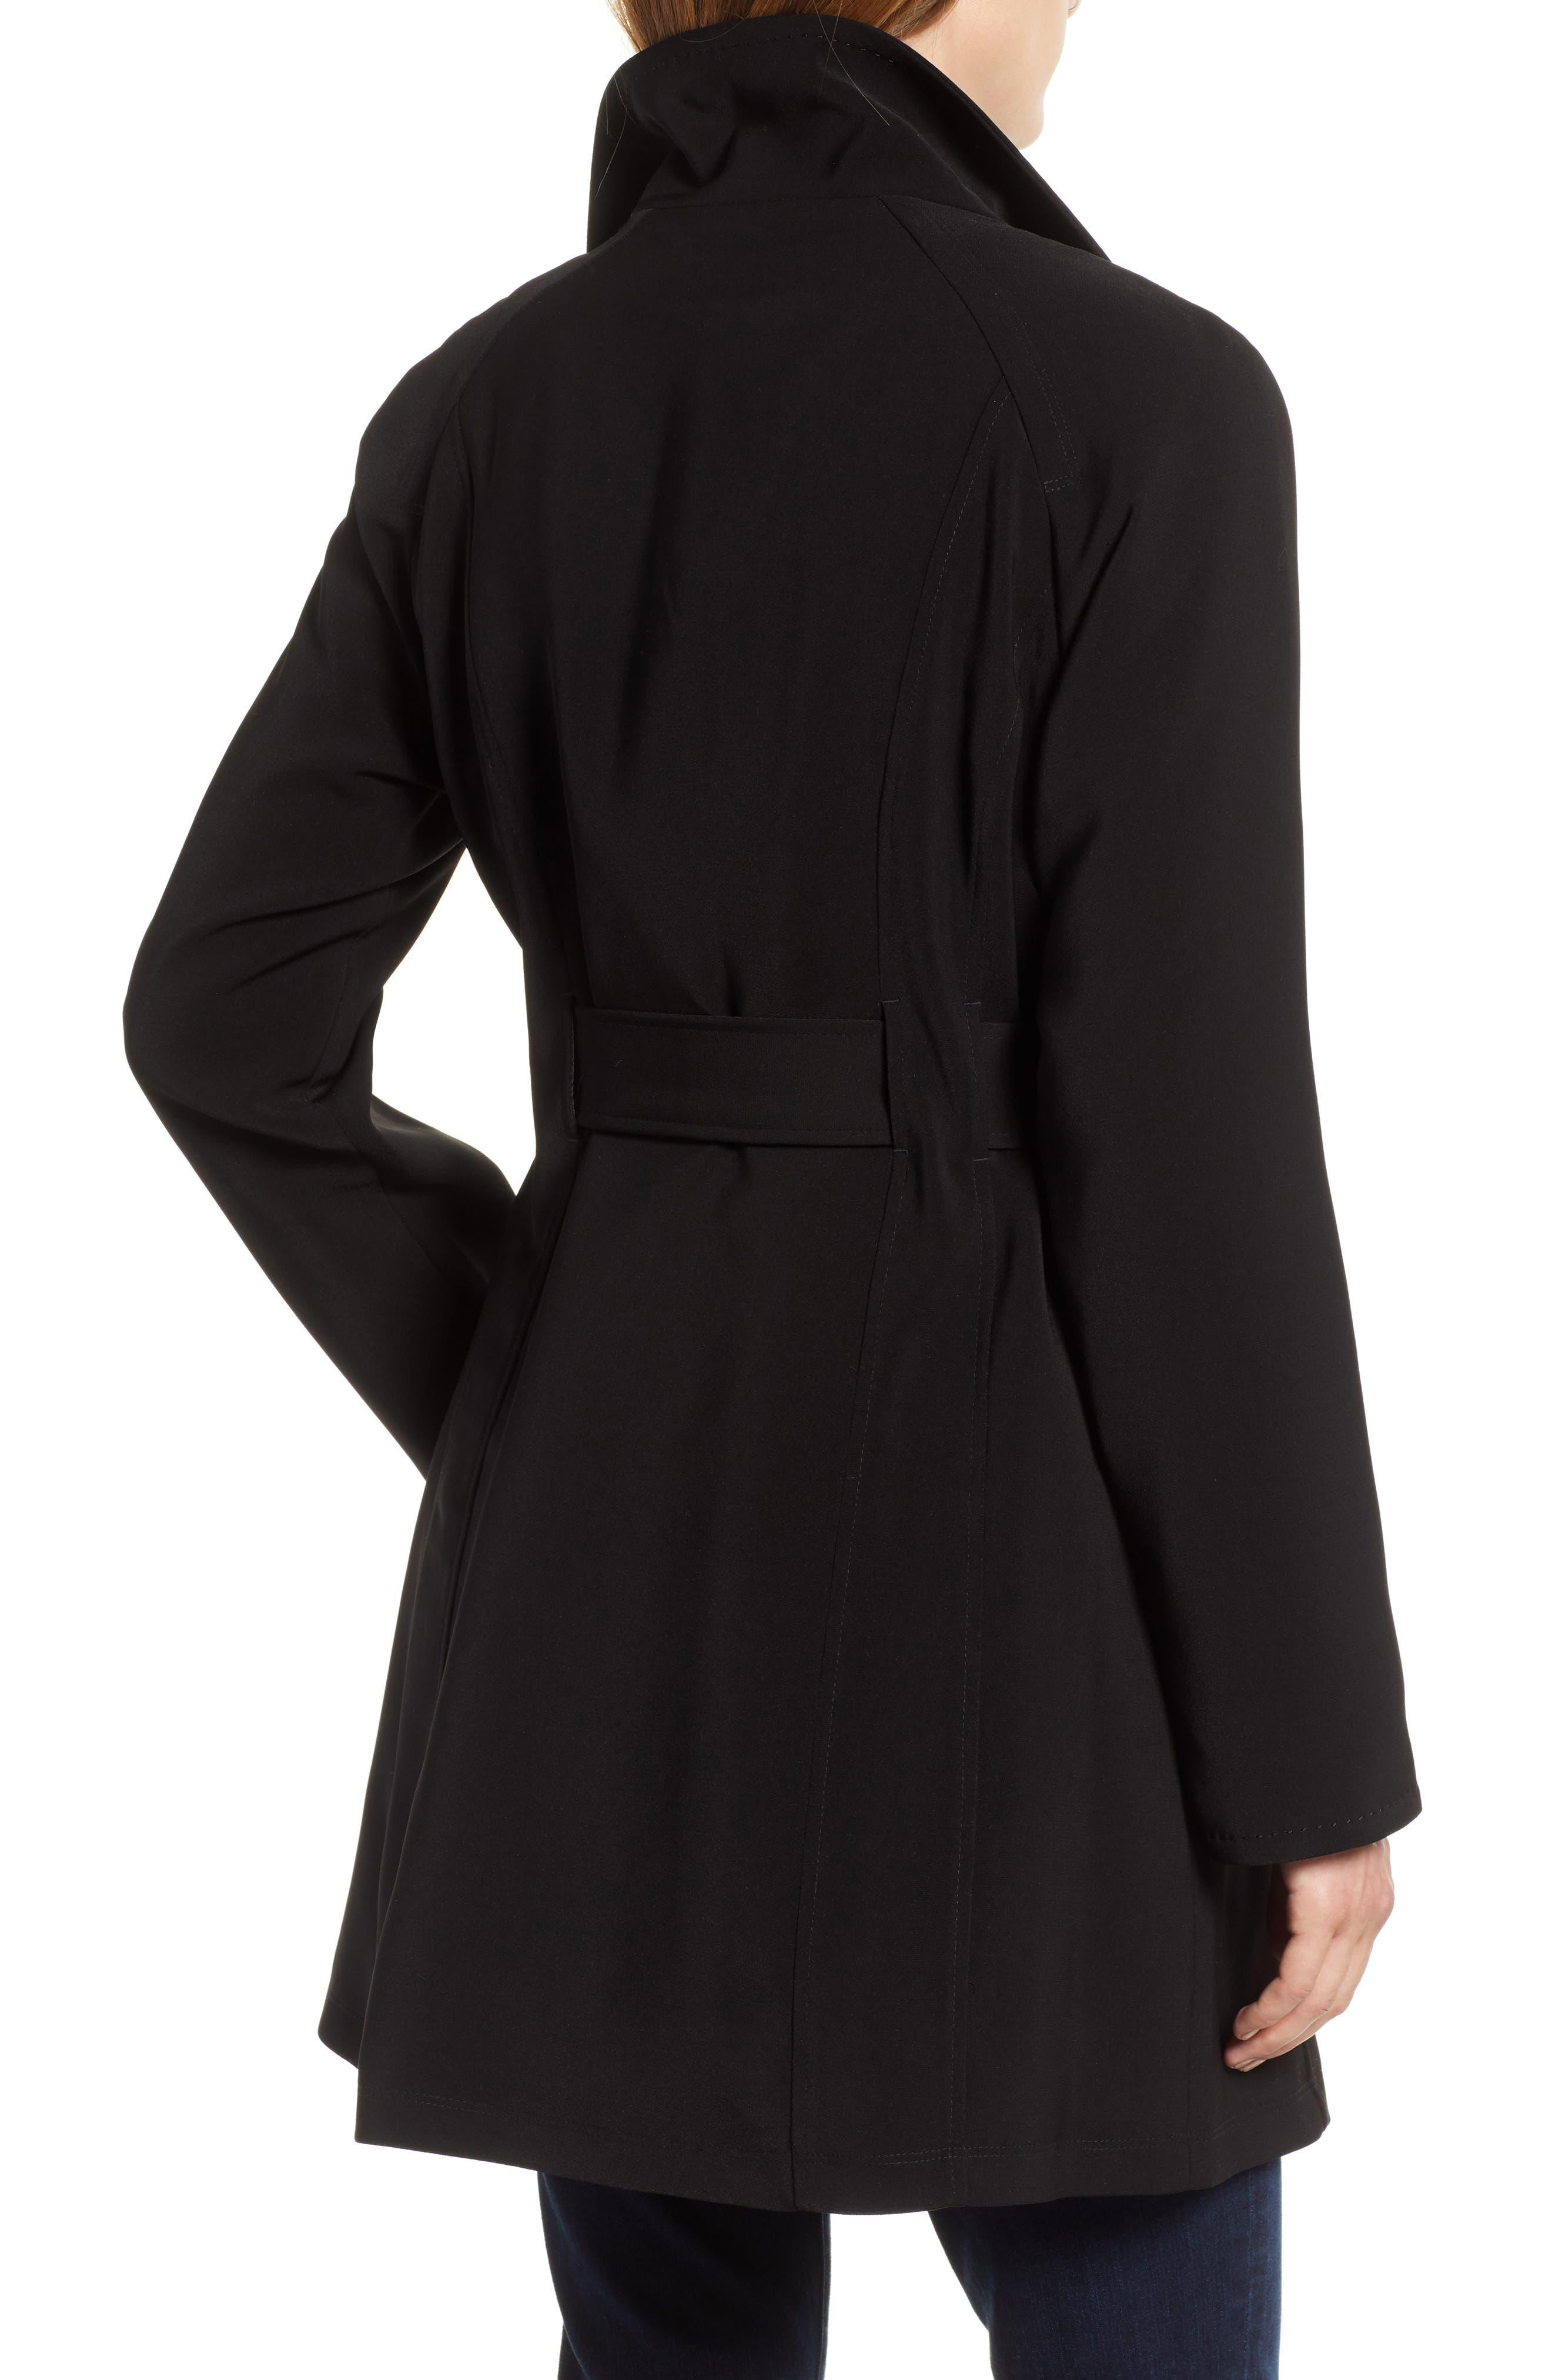 82784c8e3 Women's Gallery Coats & Jackets | Nordstrom